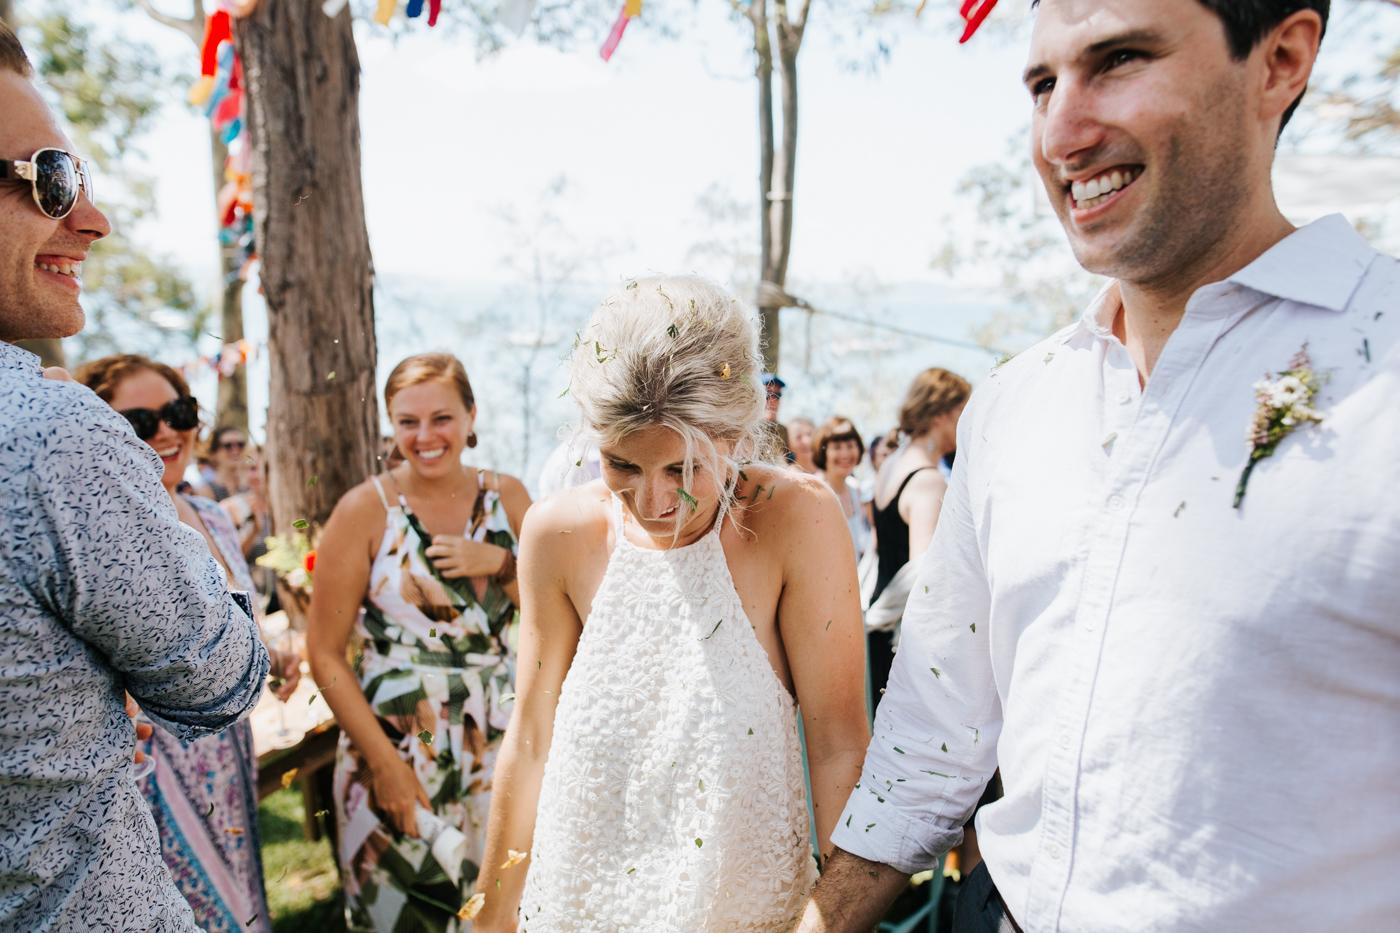 Emma & Ben - Lake Macquarie - Hunter Valley Wedding - Samantha Heather Photography-130.jpg